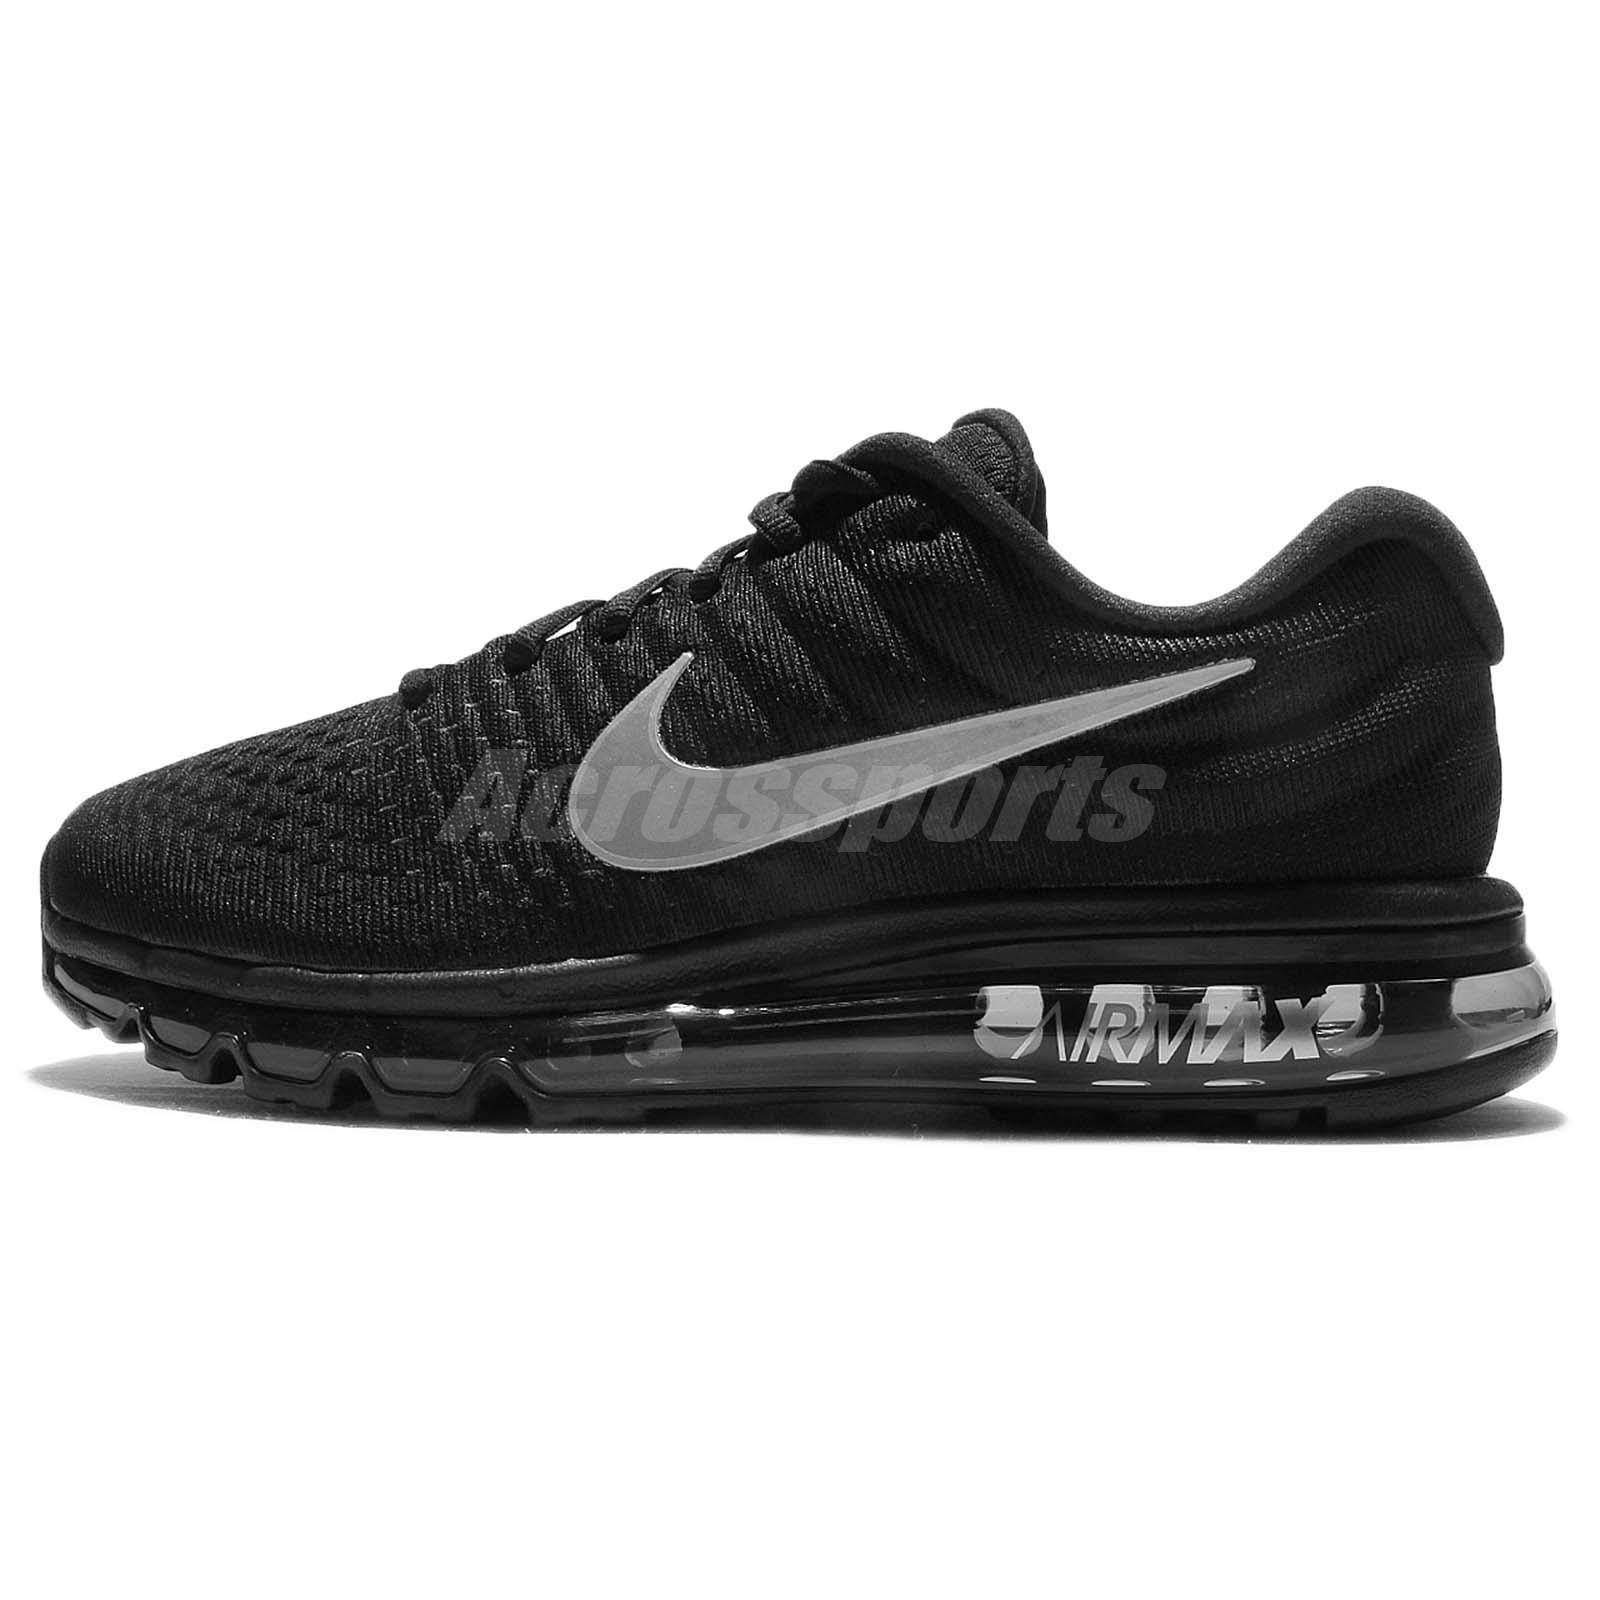 nike air max 2017 black grey men running shoes sneakers. Black Bedroom Furniture Sets. Home Design Ideas